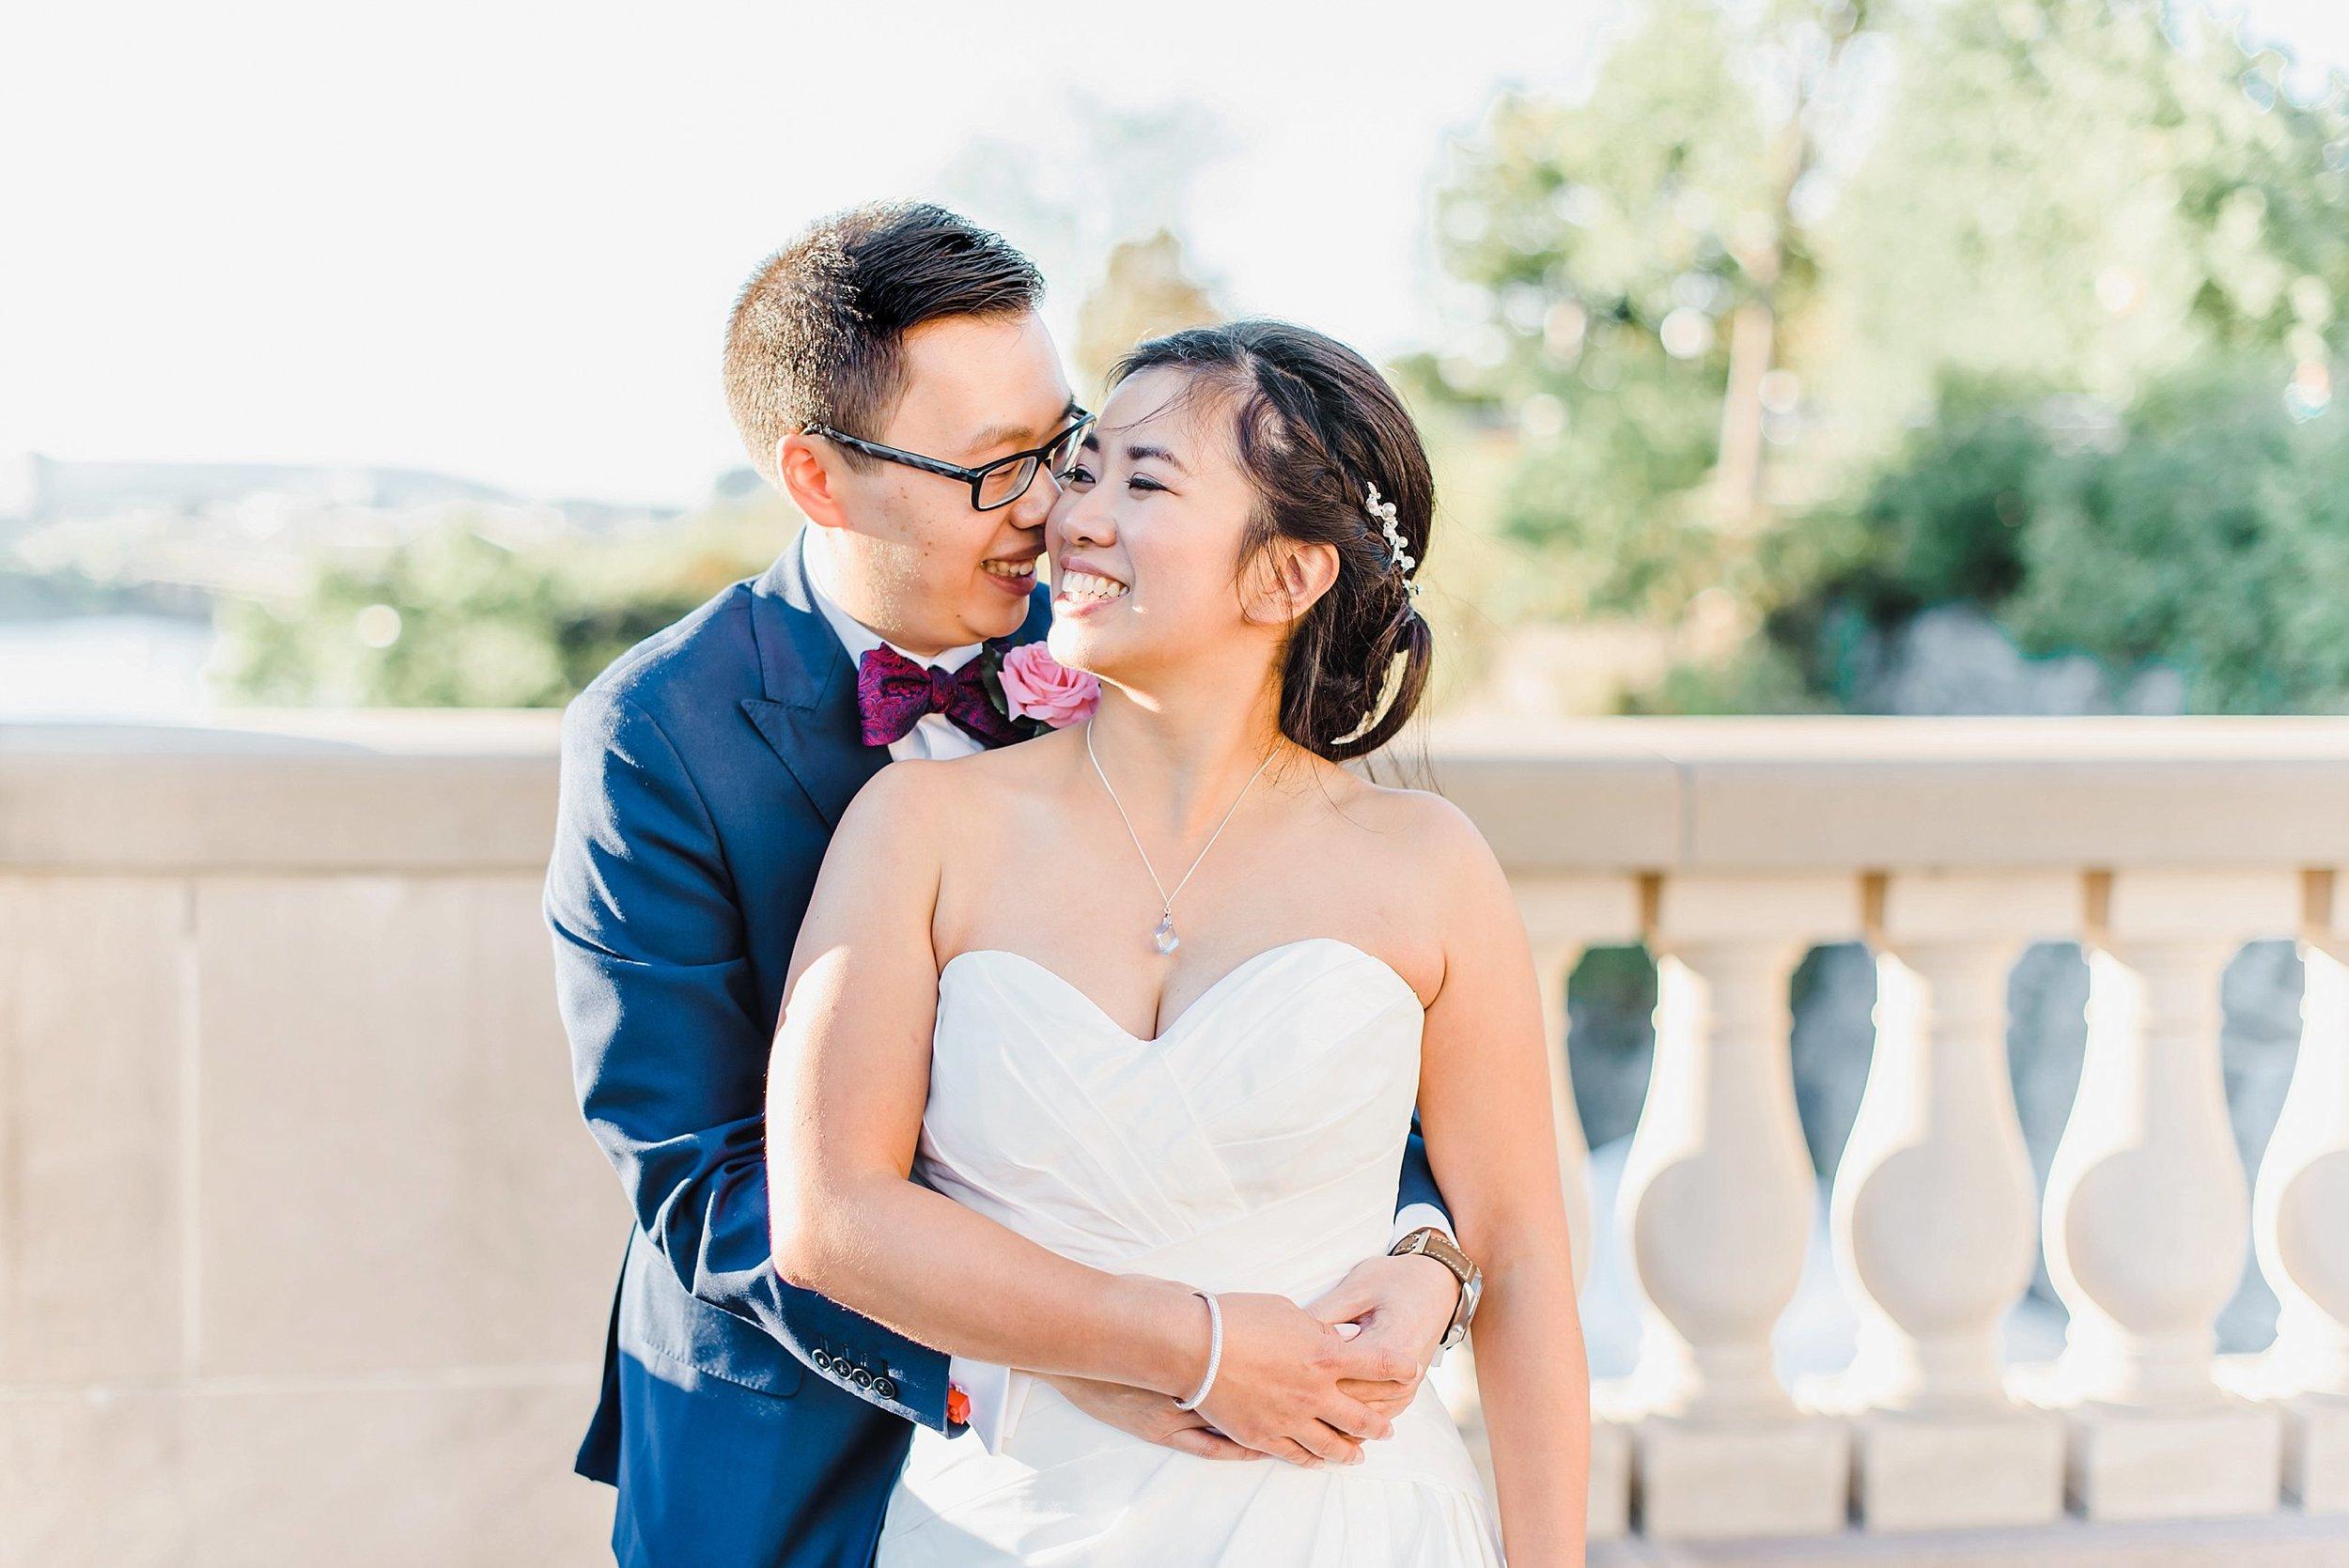 light airy indie fine art ottawa wedding photographer | Ali and Batoul Photography_1552.jpg